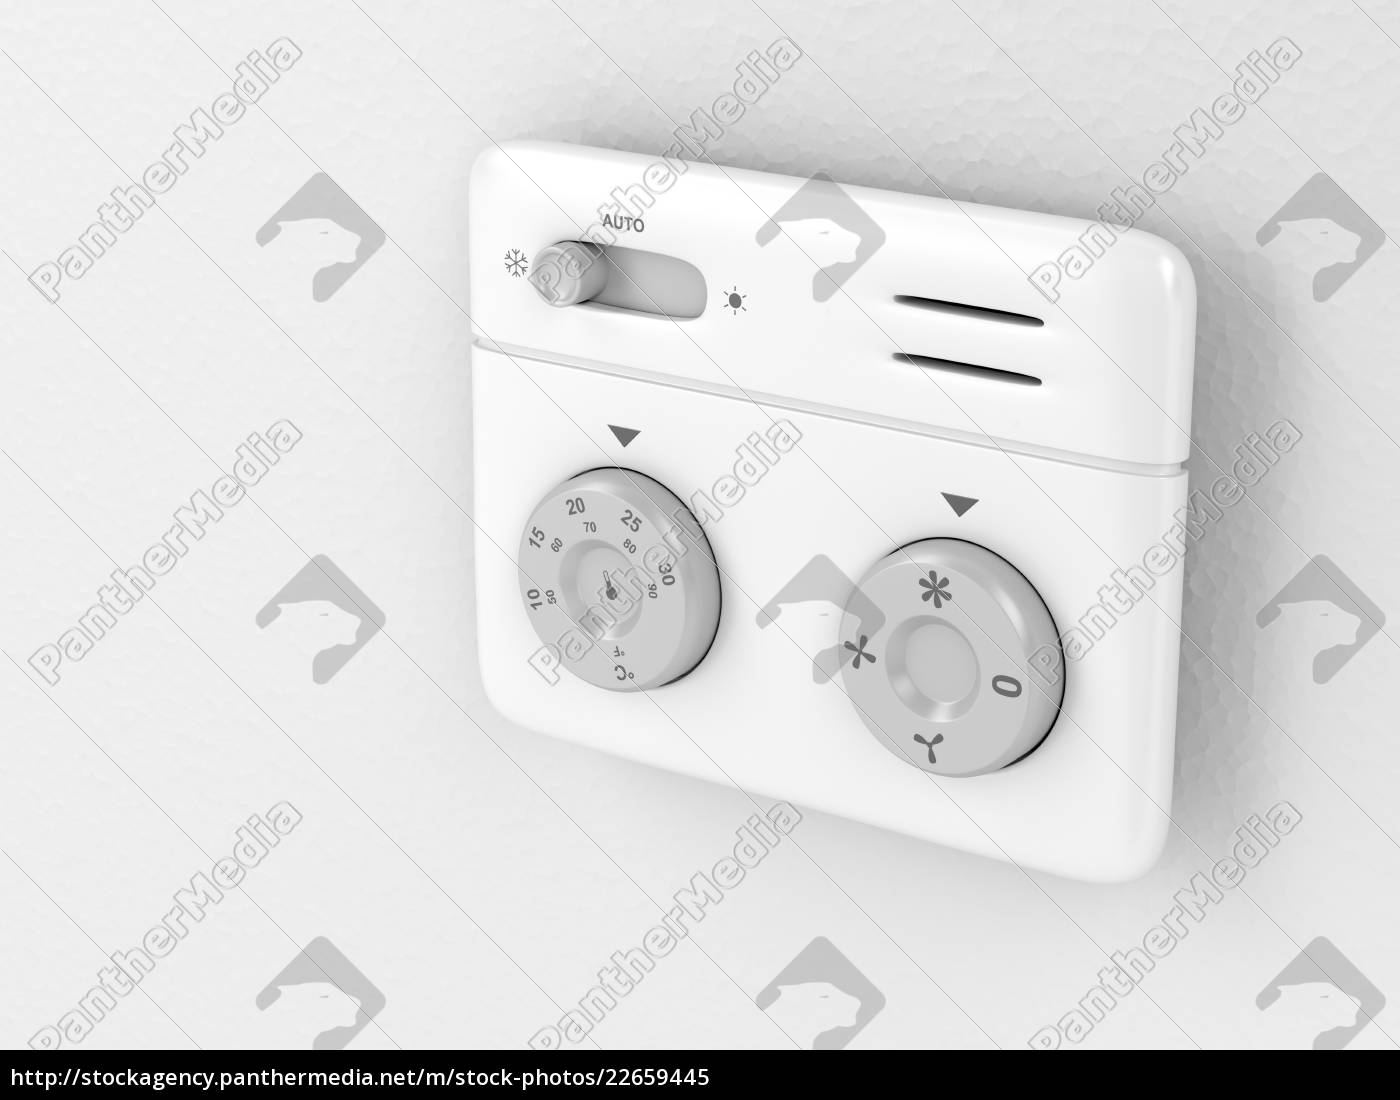 thermostat - 22659445